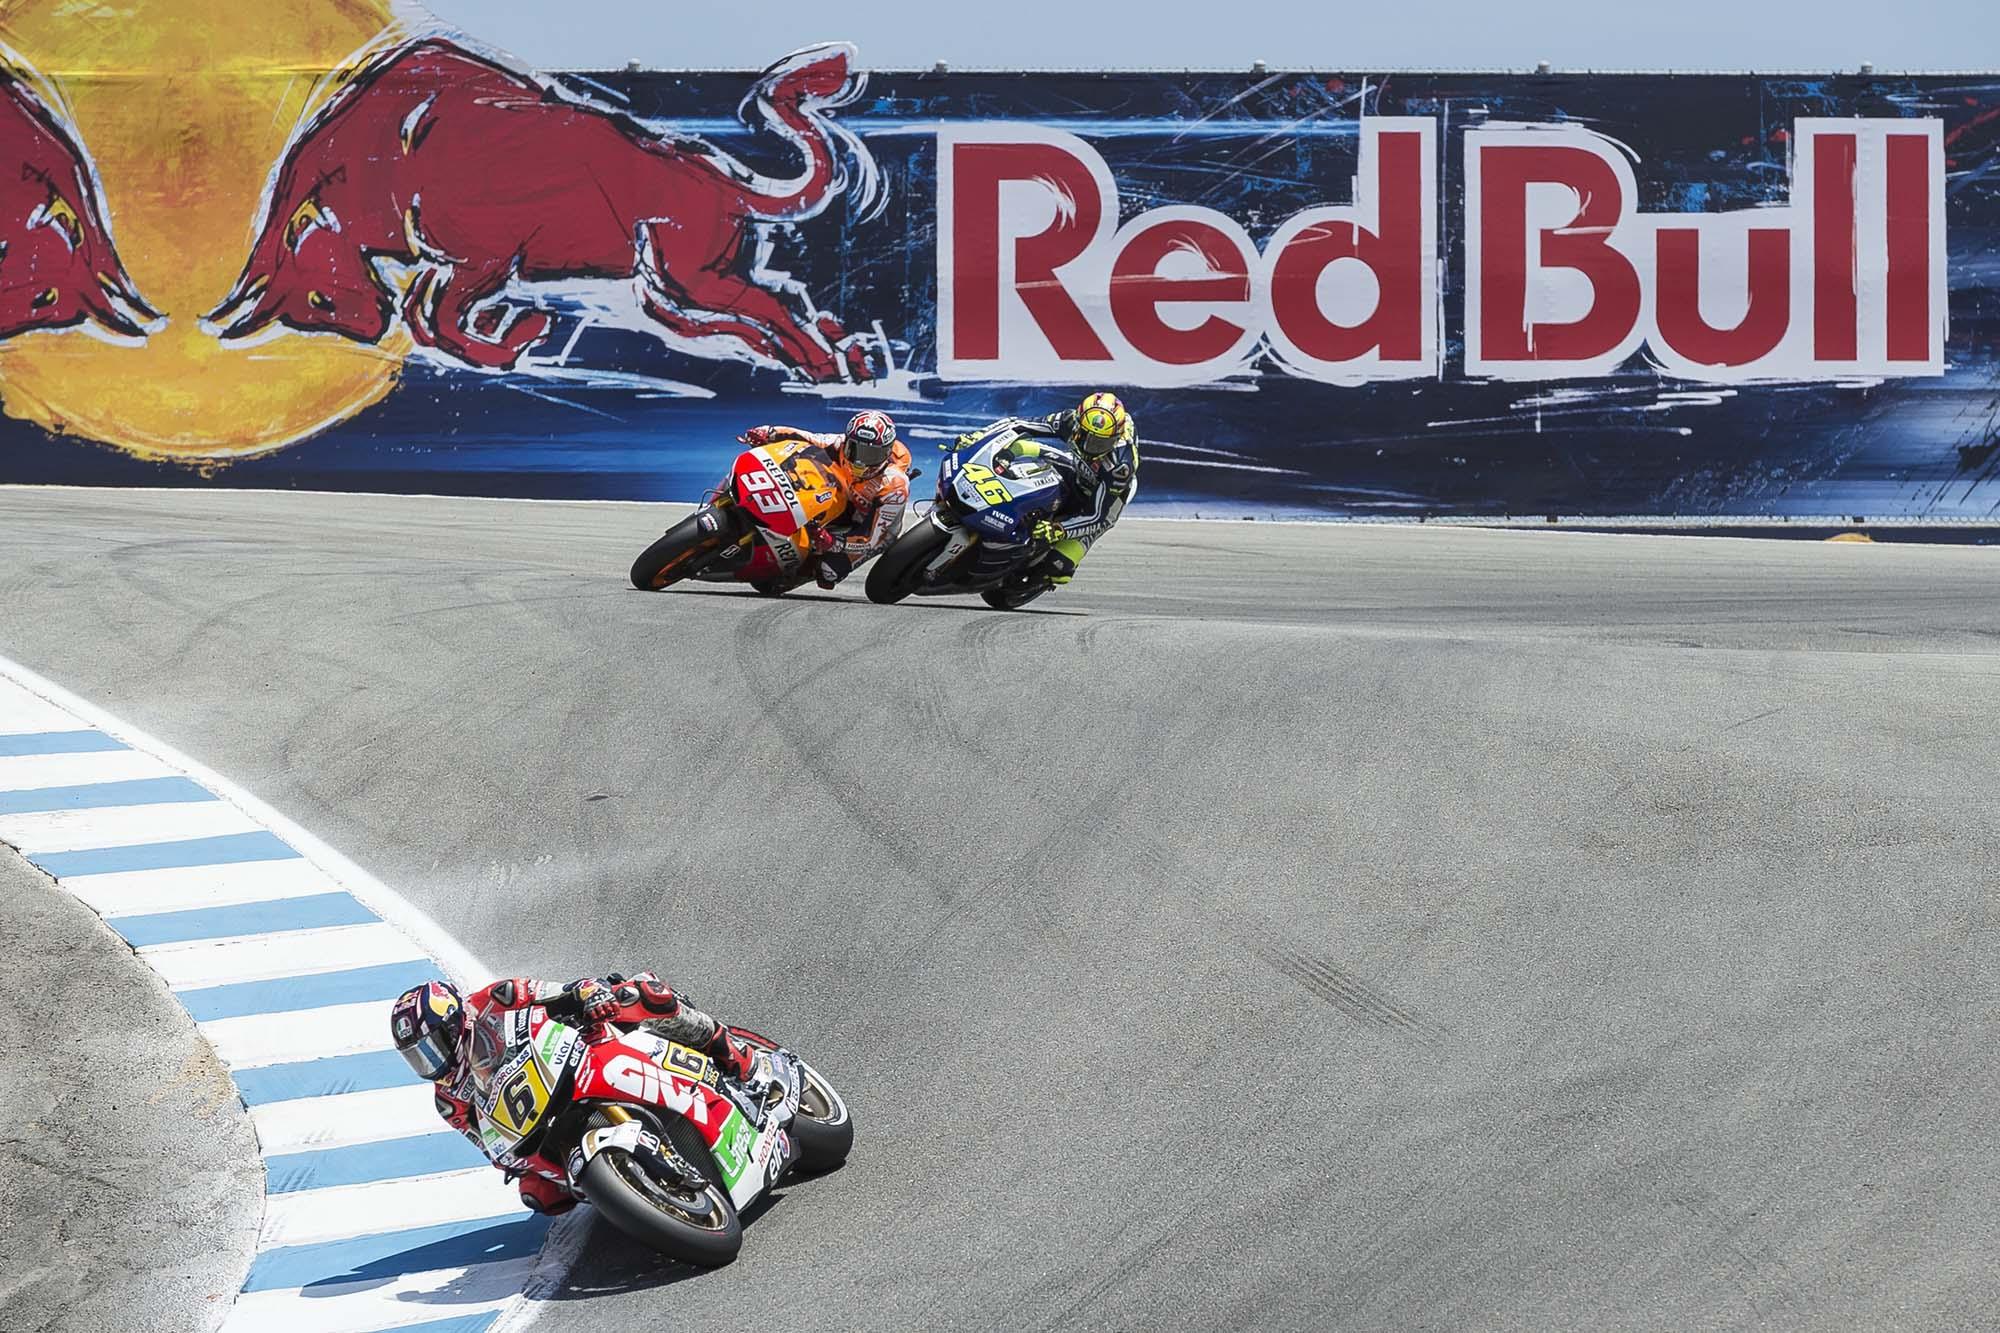 GP Laguna Seca - Page 3 Marc-Marquez-Valentino-Rossi-Laguna-Seca-Corkscrew-Pass-Kevin-Warren-2